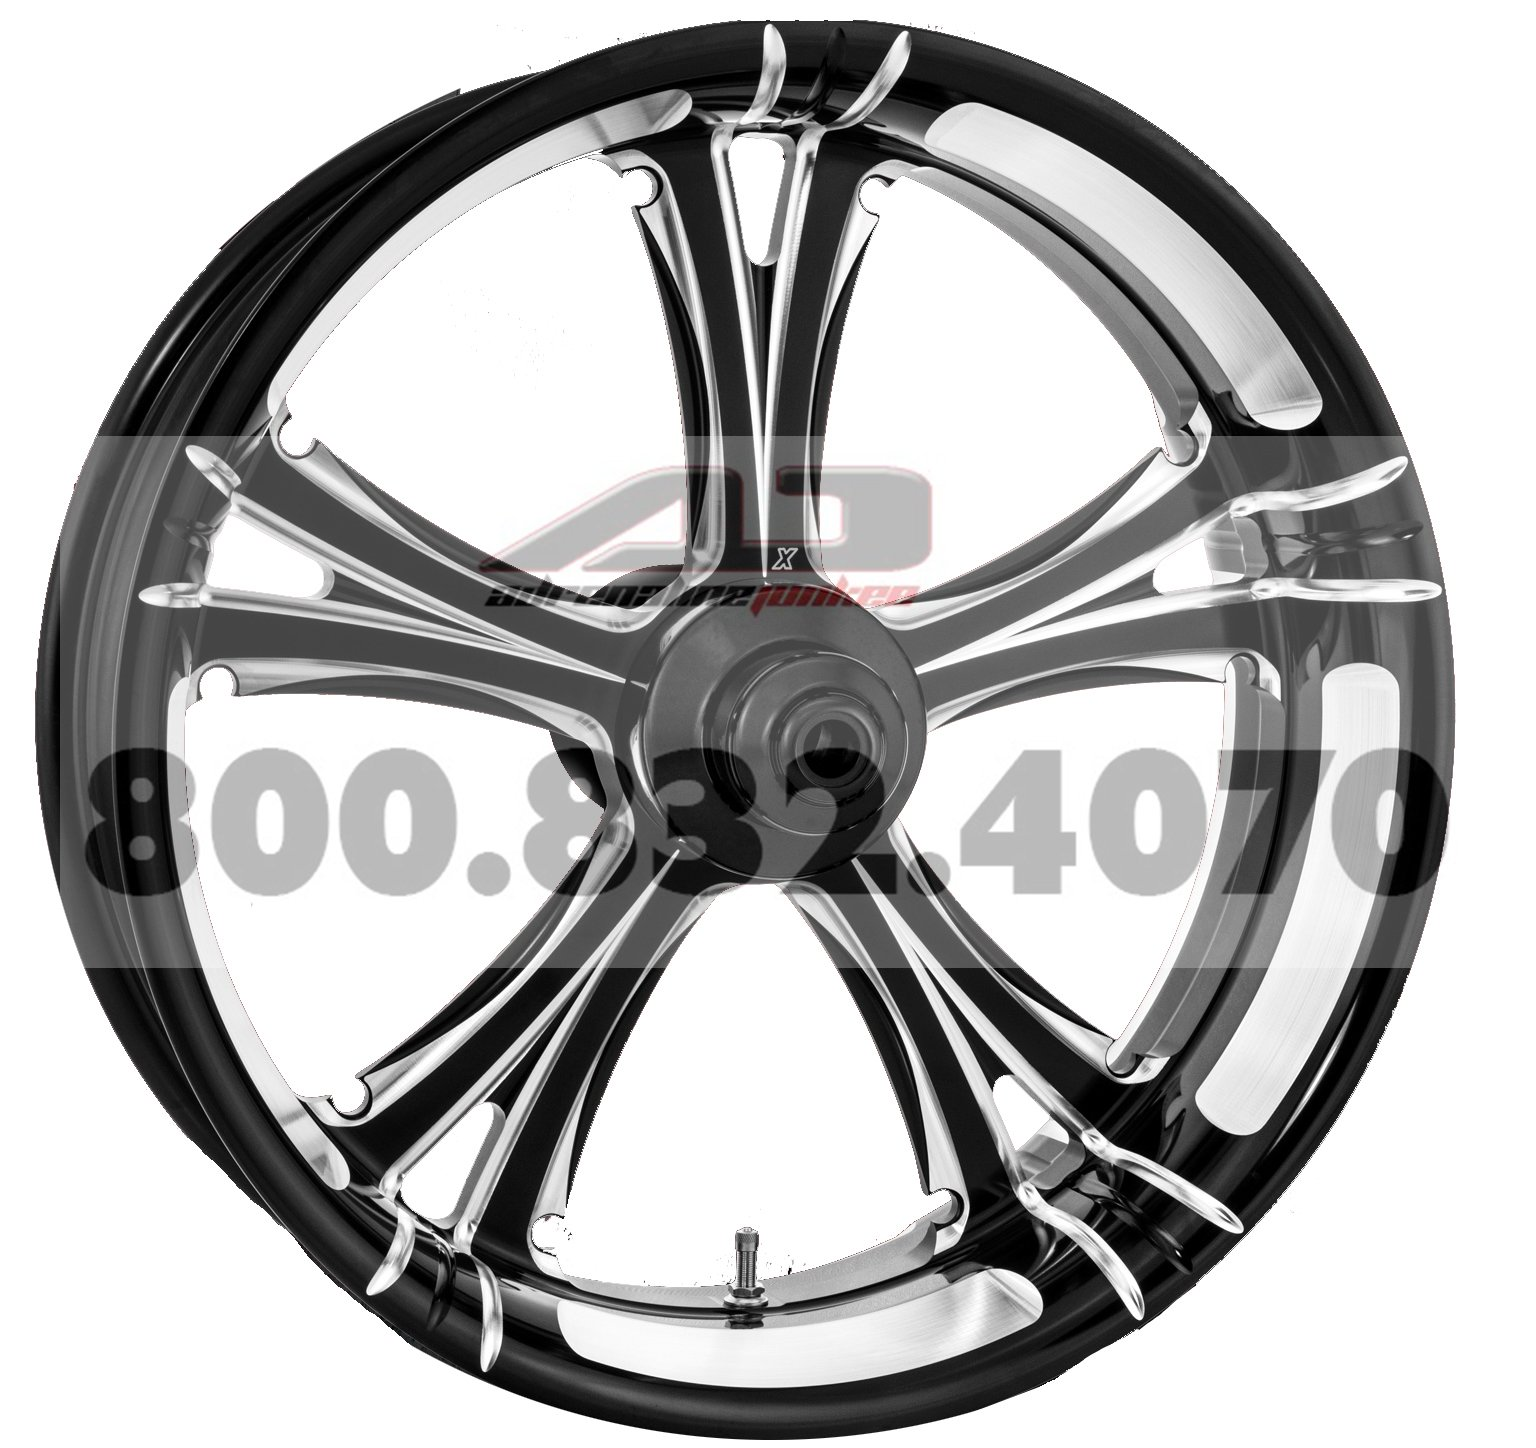 Xtreme Machine Fierce Rear Wheel - 18x5.5 - Black Cut , Color: Black, Position: Rear, Rim Size: 18 1256-7814R-XFR-BM by Xtreme Machine (Image #1)